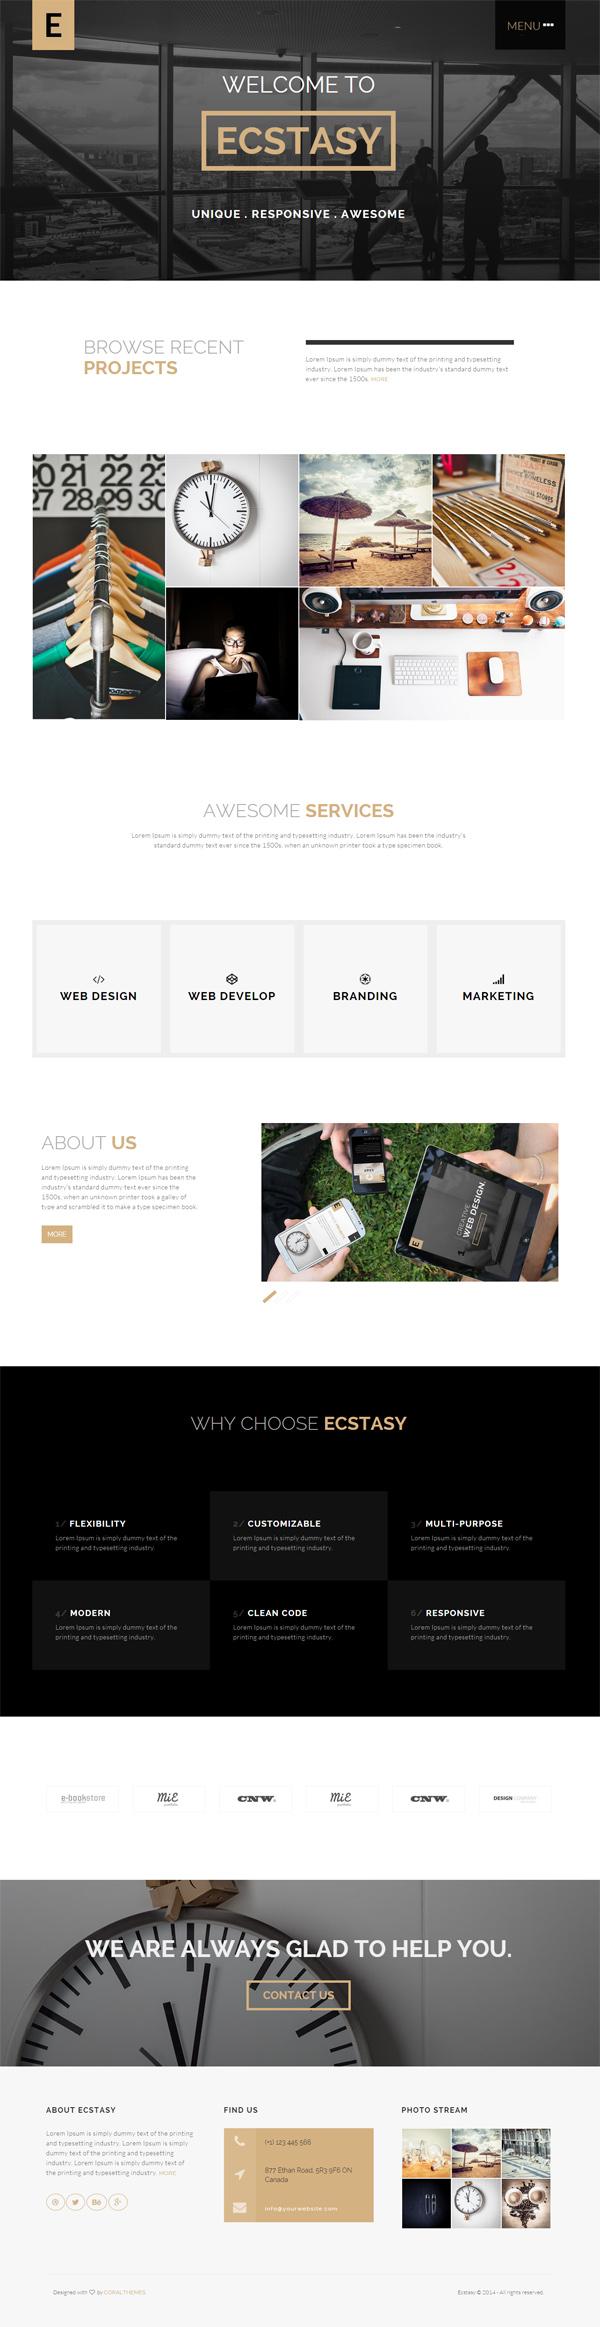 Ecstasy - Responsive HTML5 Multi-purpose Template